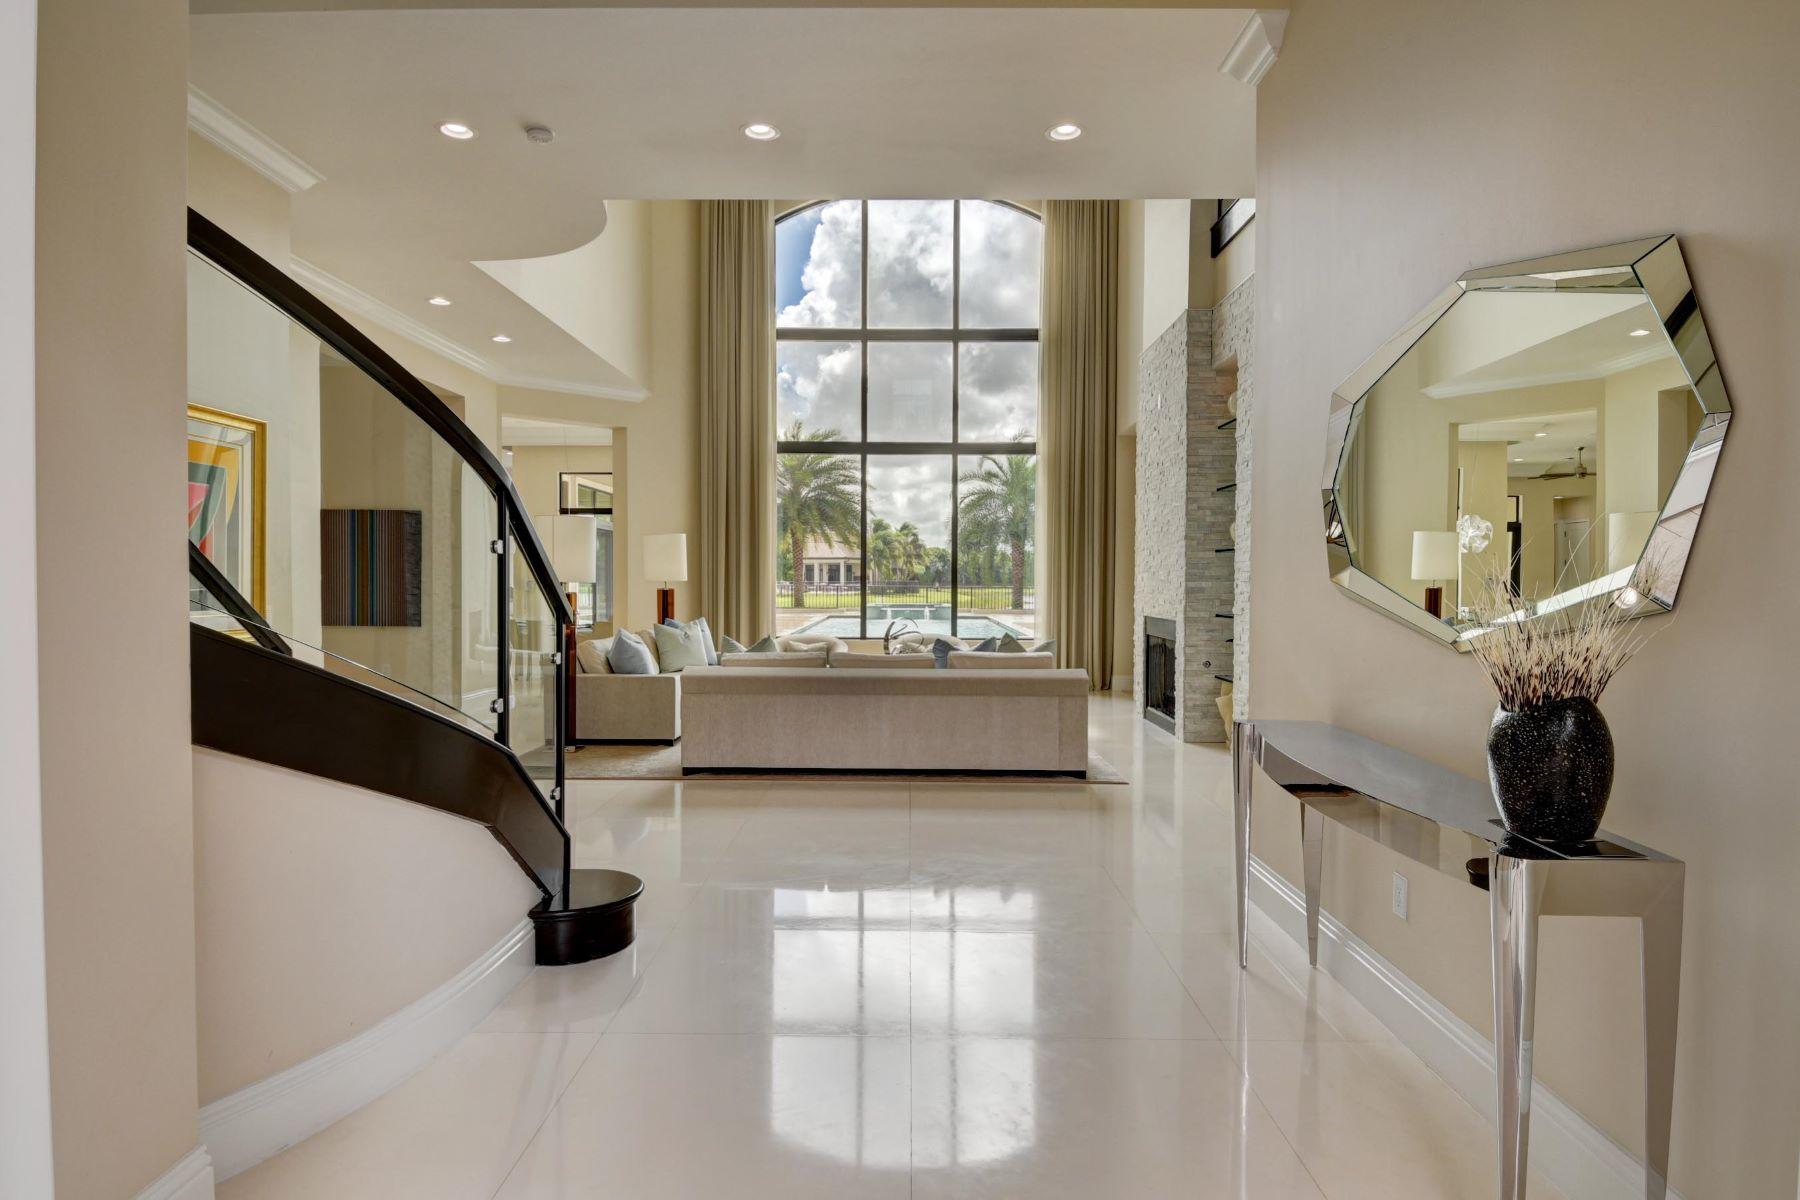 Single Family Home for Active at 16793 Crown Bridge Drive 16793 Crown Bridge Drive Delray Beach, Florida 33446 United States